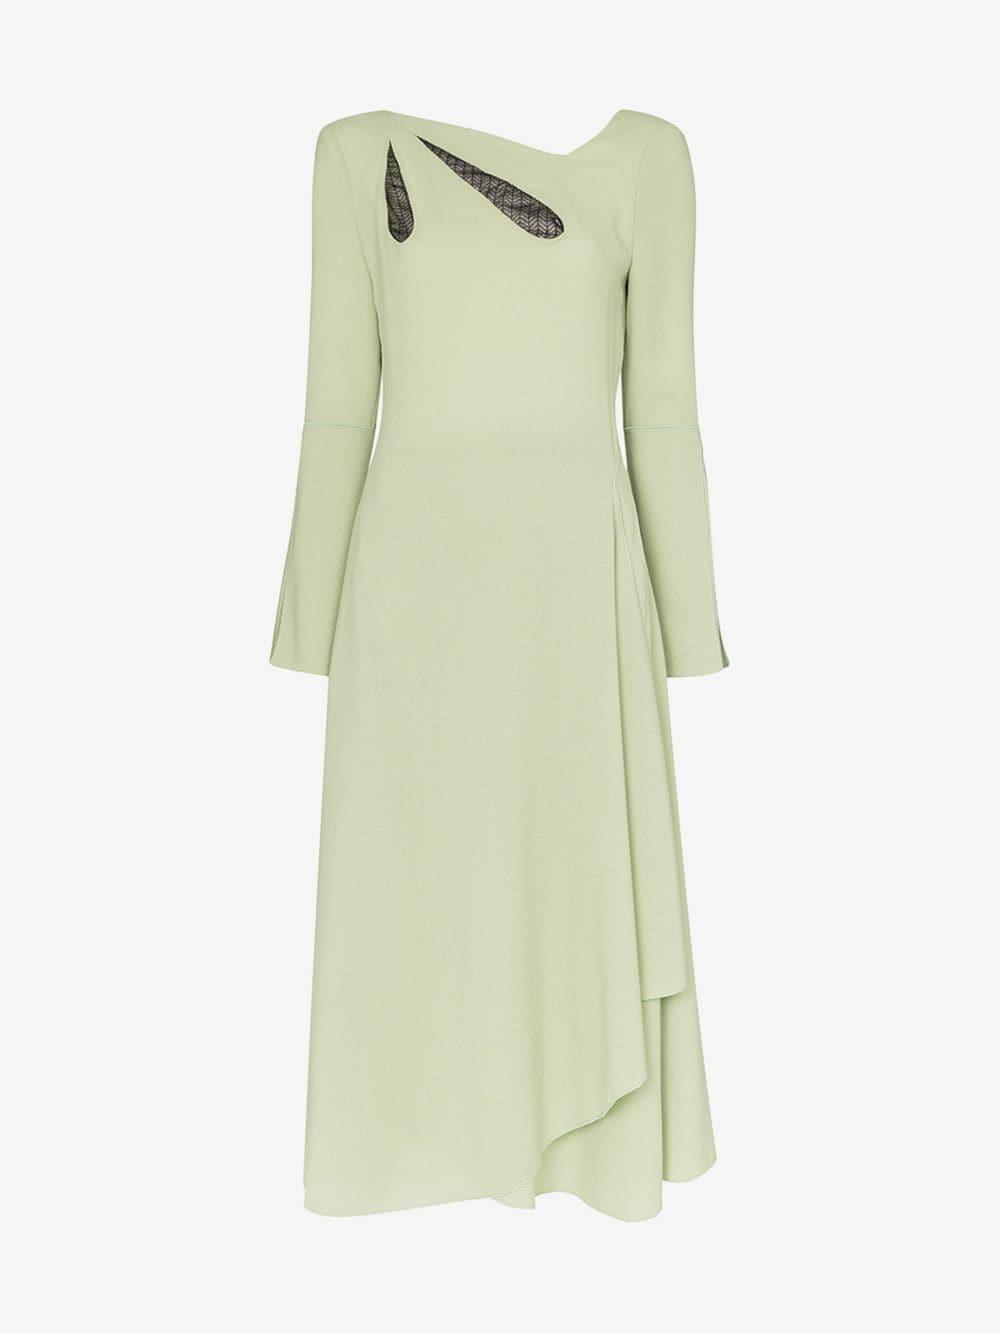 Roland Mouret Oreti cutout detail asymmetric wool dress in green